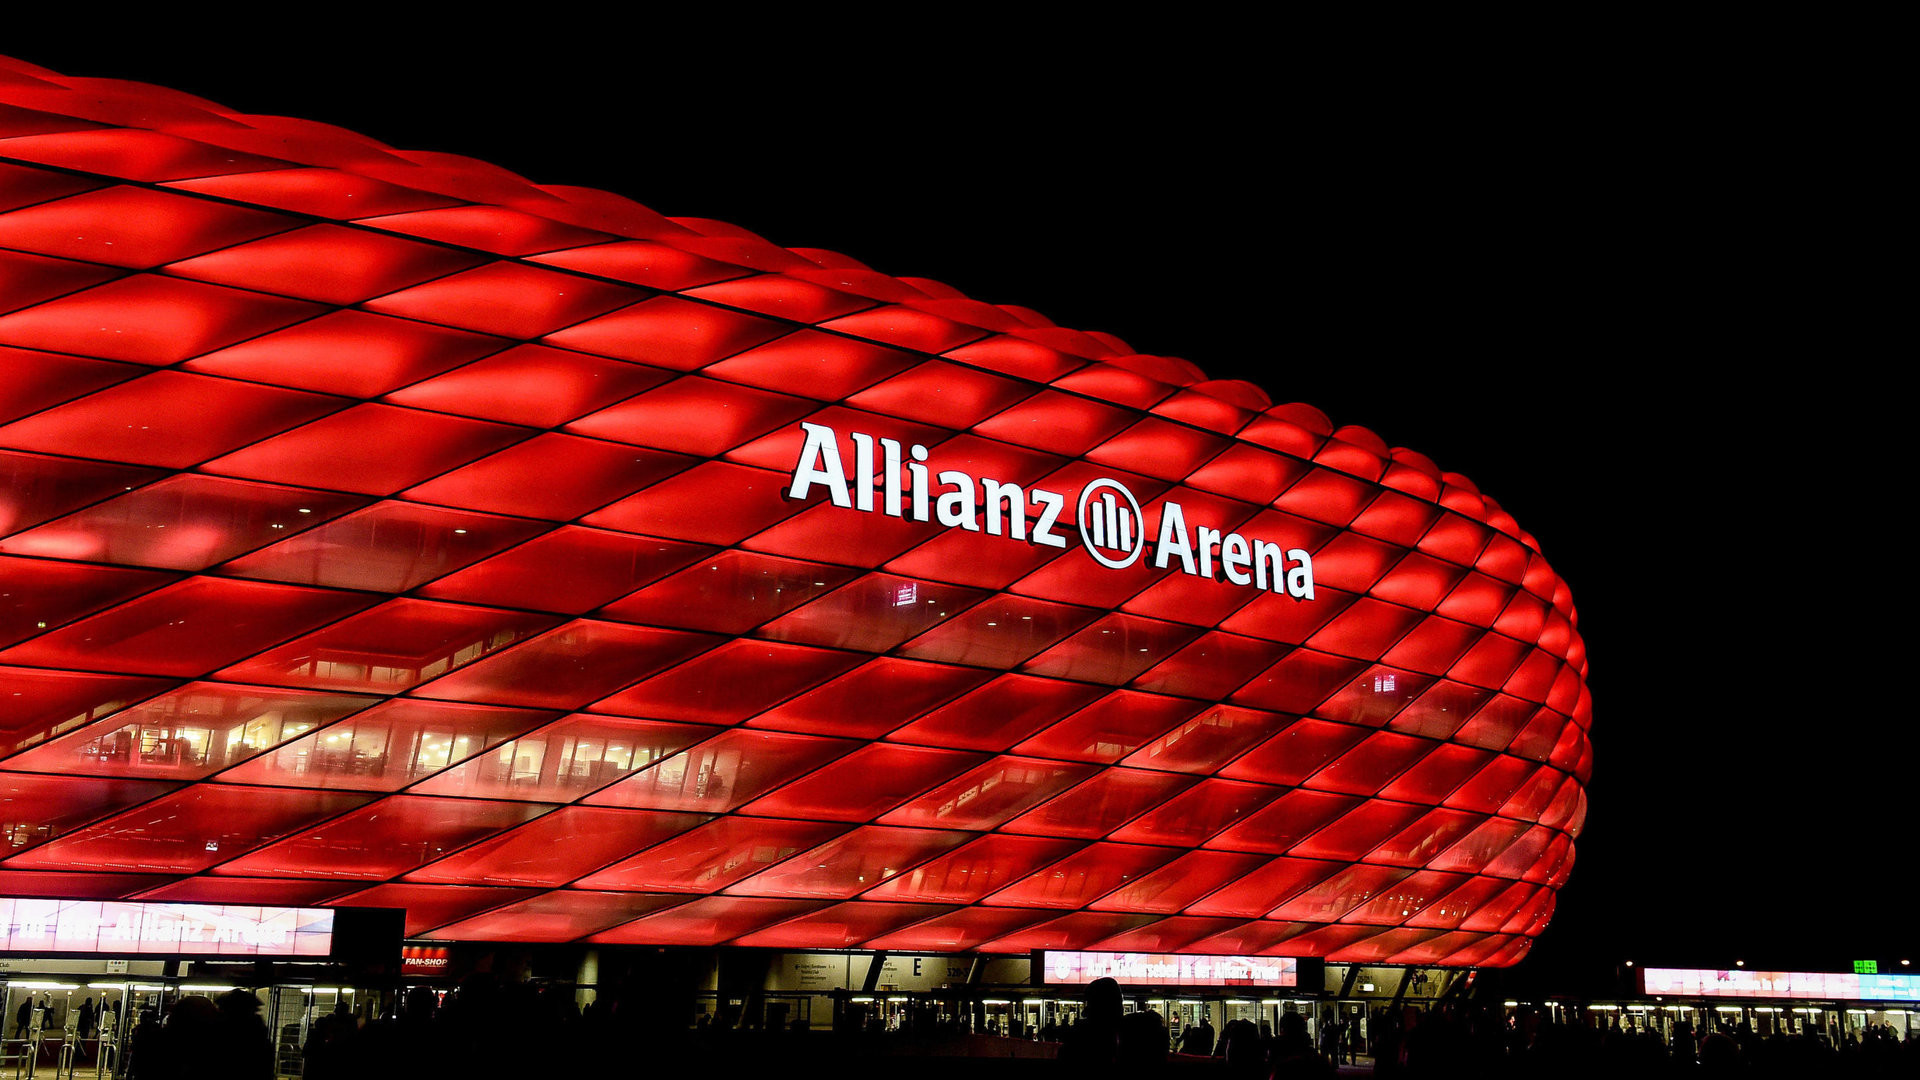 16 Luxury Pubg Wallpaper Iphone 6: Allianz Arena Wallpapers (63+ Images